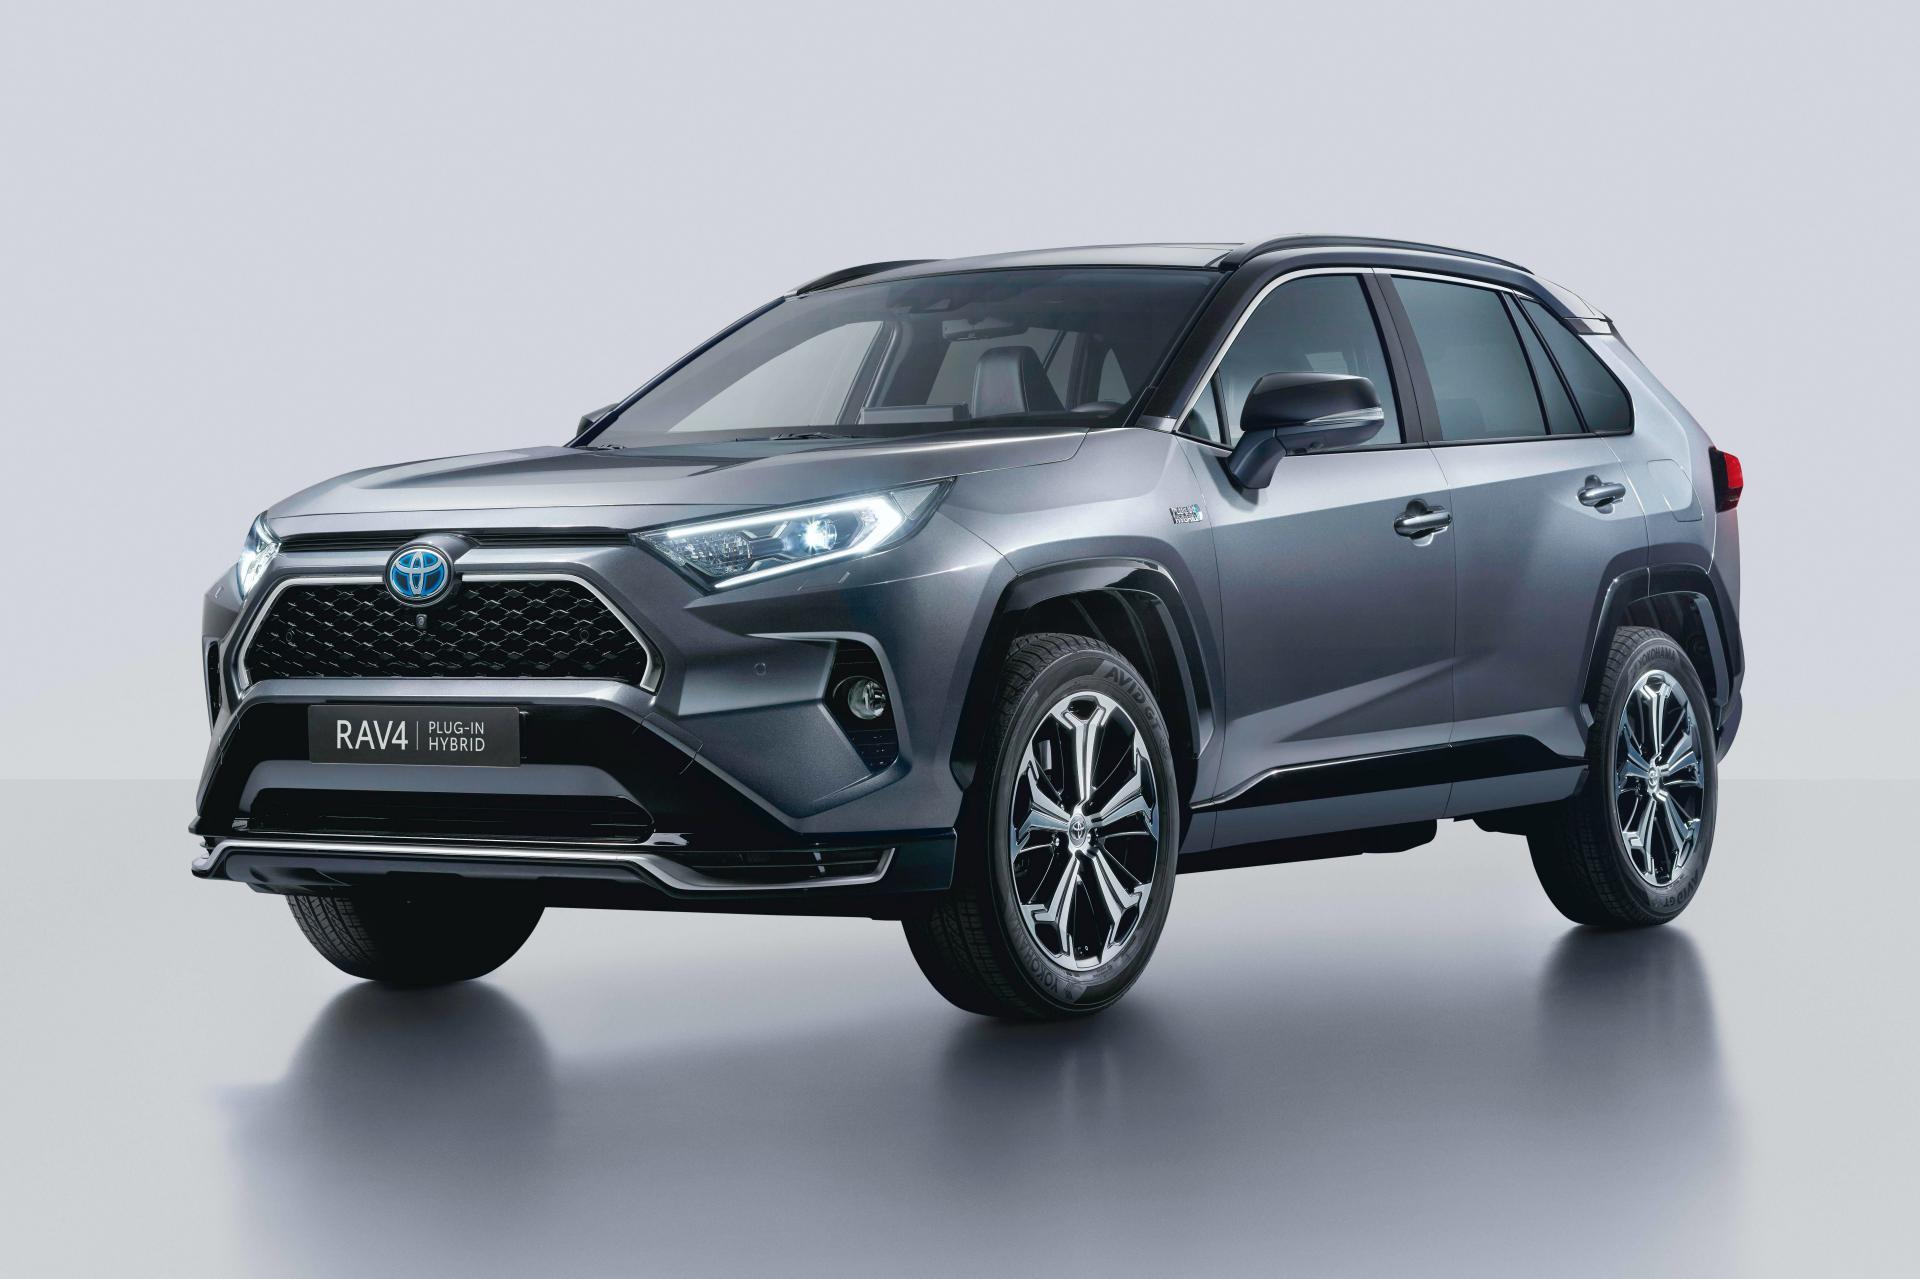 2021 Toyota Rav4 Plug In Hybrid Is The Prime S European Cousin Autoevolution